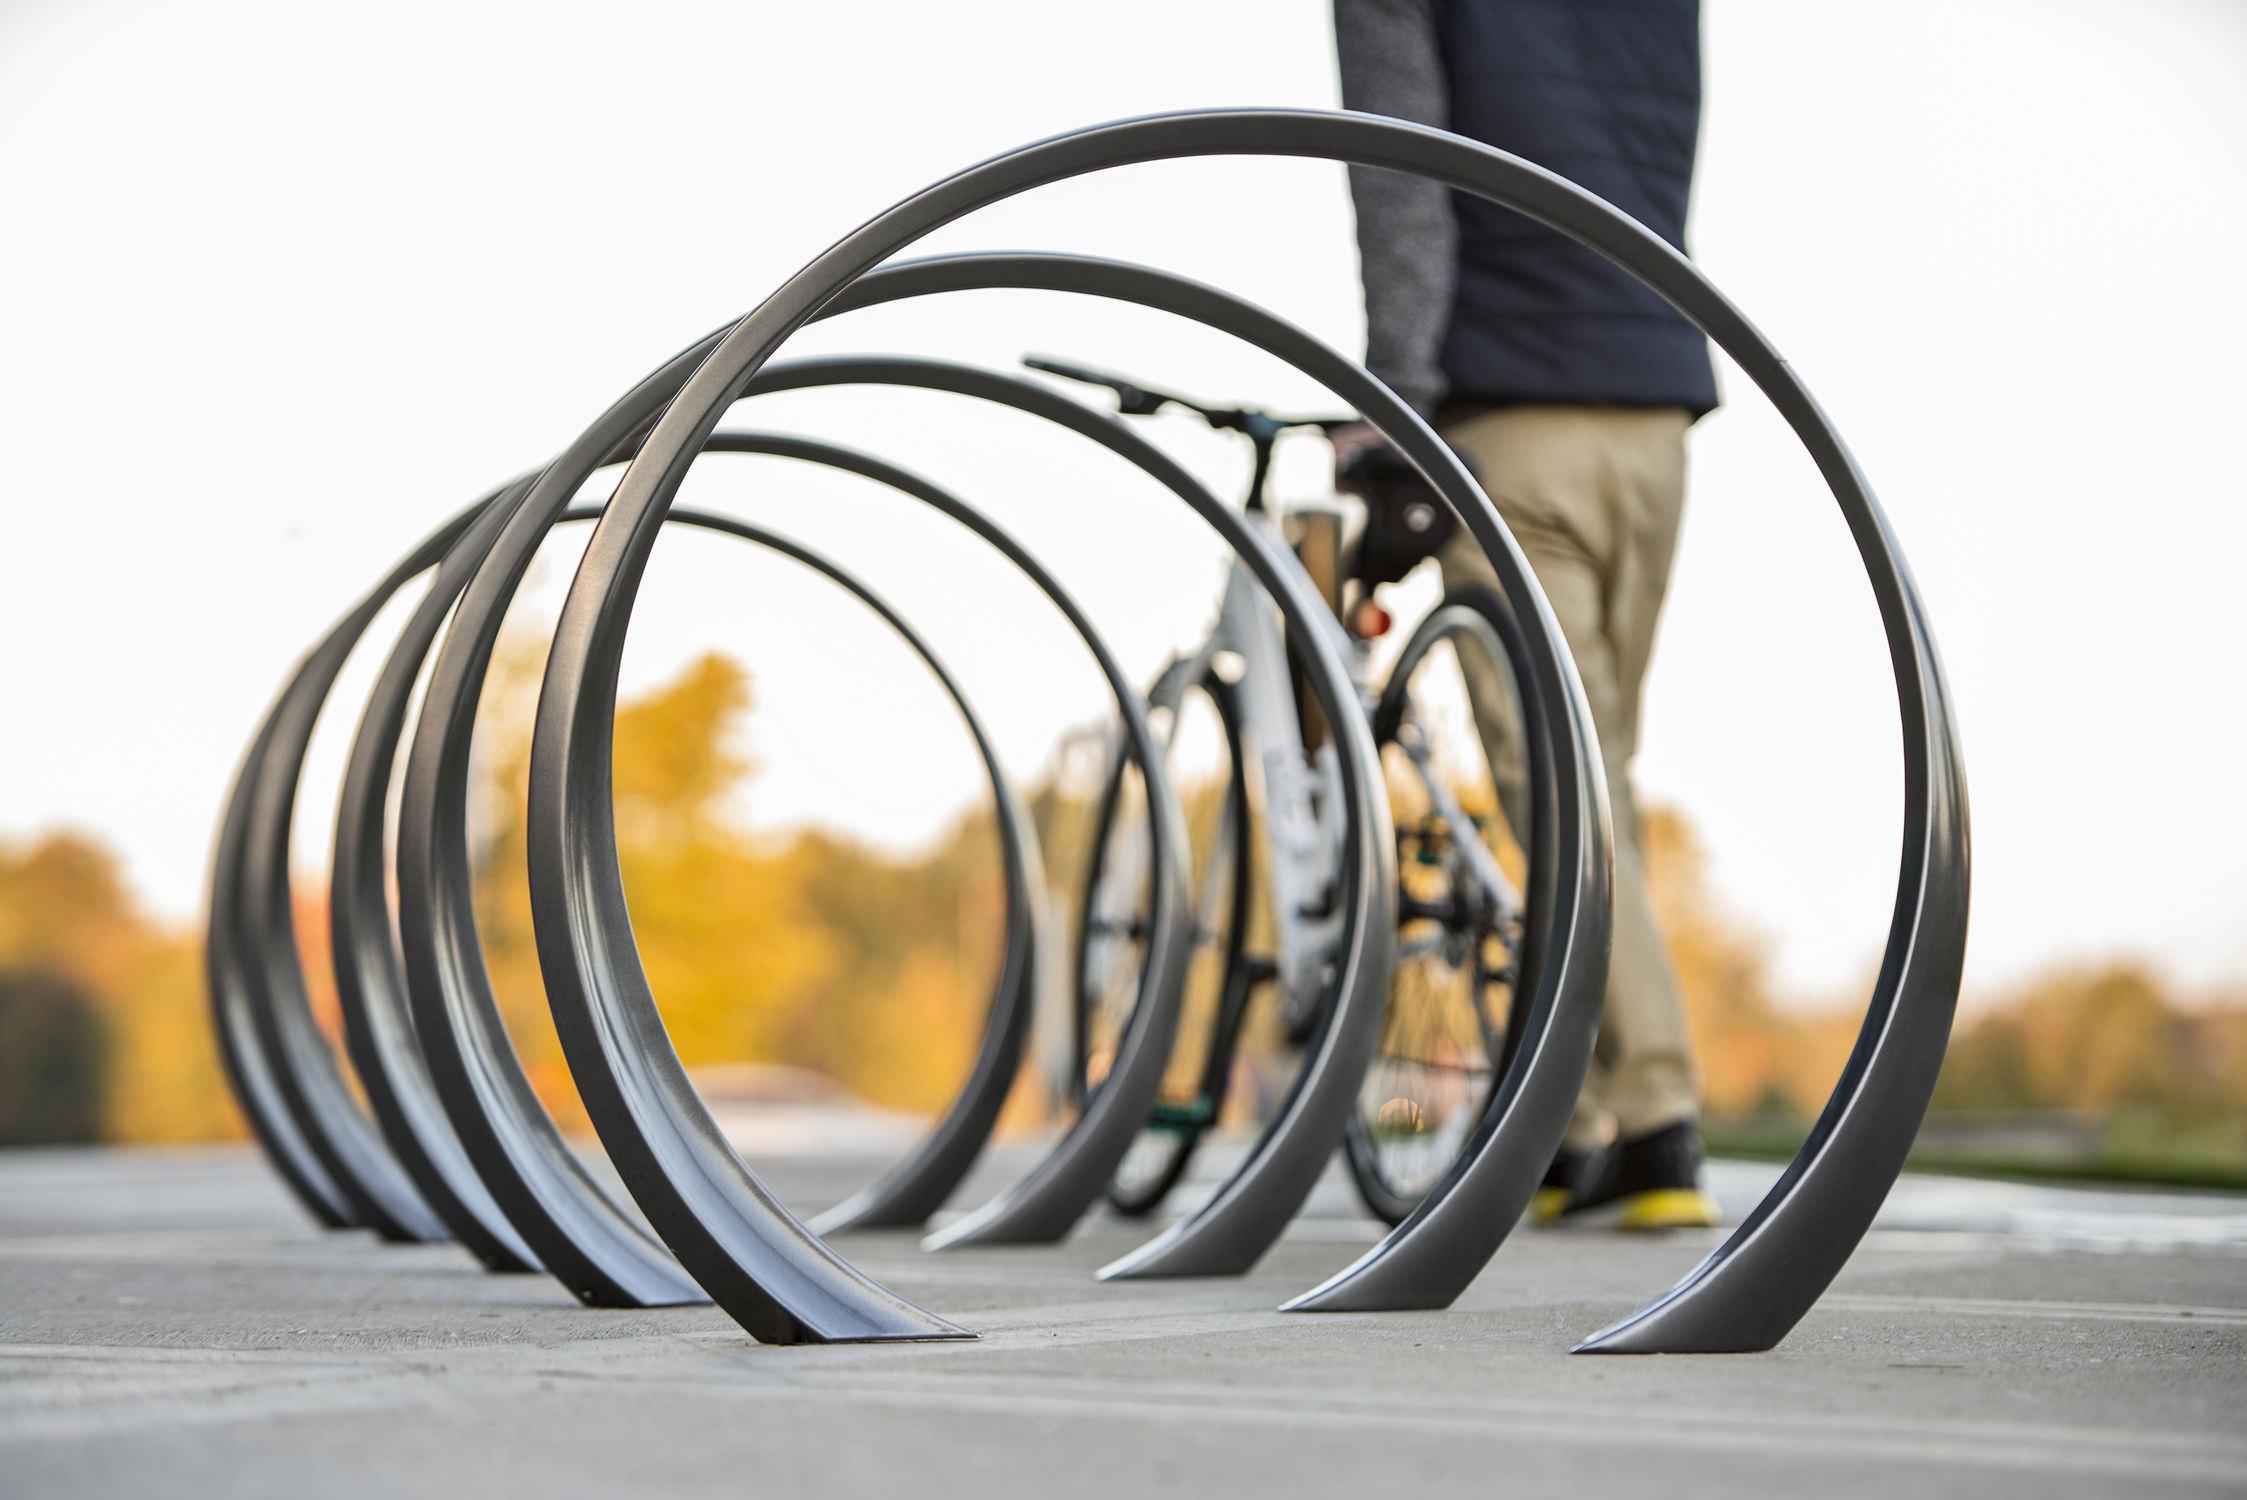 rack bike